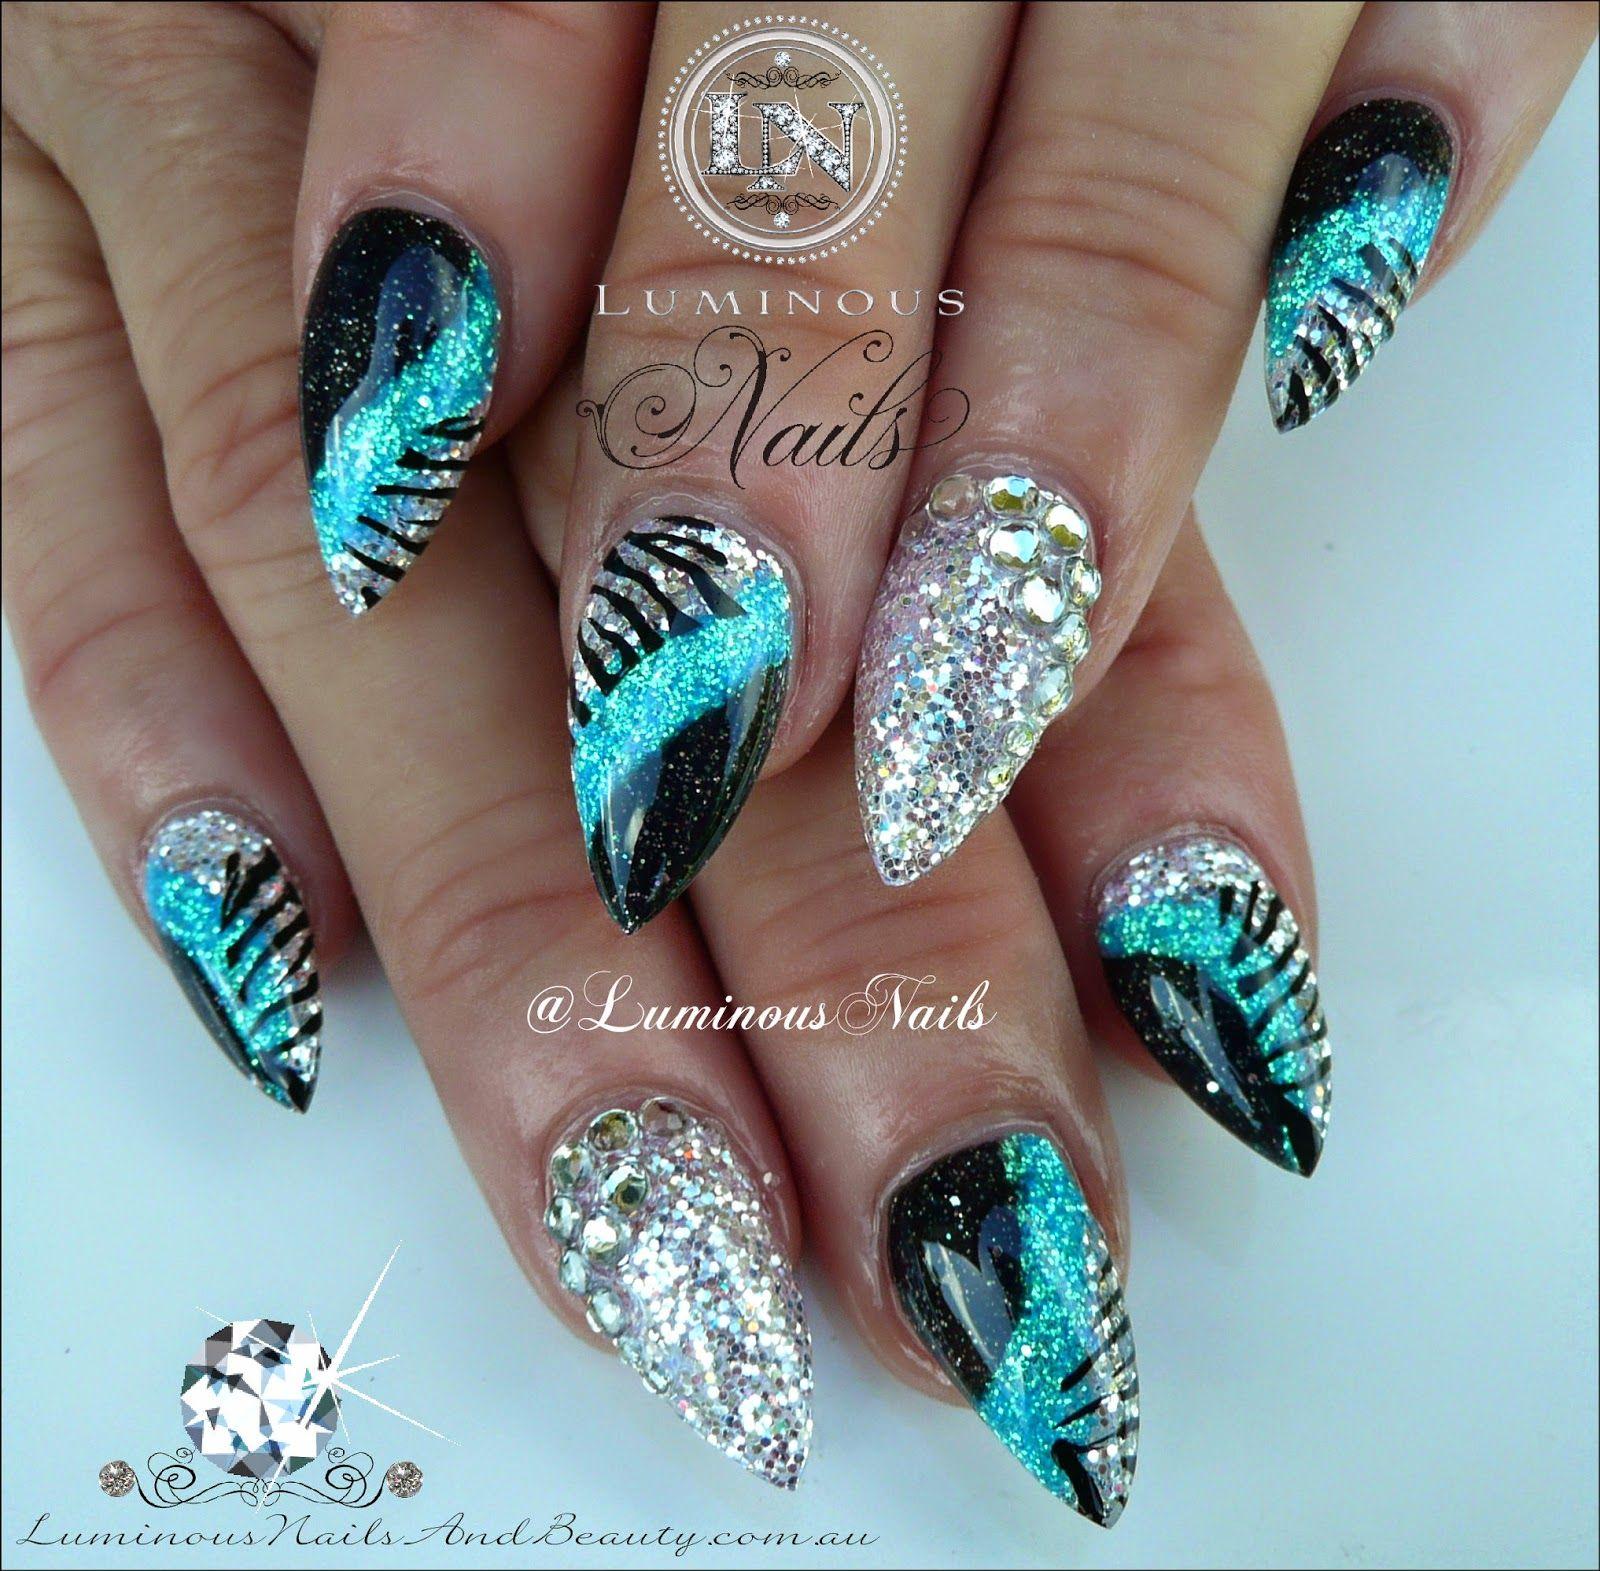 Pink zebra nails nails pinterest - Luminous Nails Blue Silver Black Acrylic Nails With Zebra Stripes